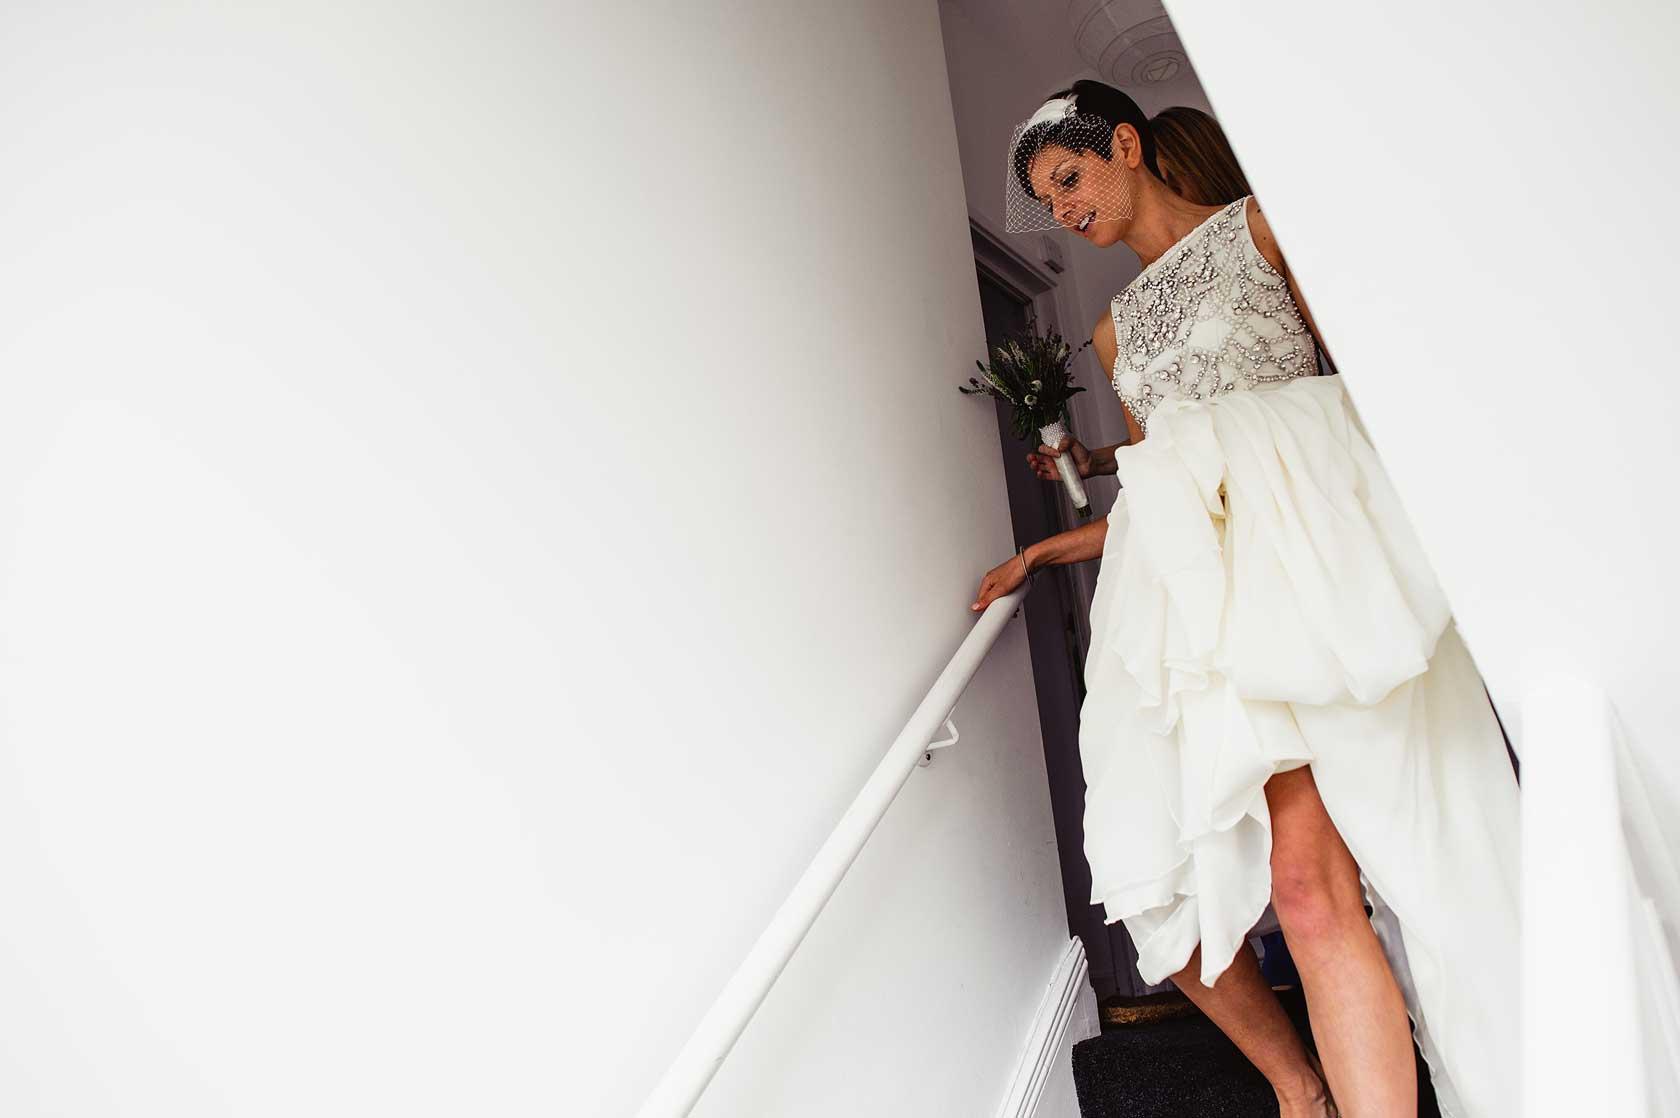 Reportage Wedding Photography at Islington Metalworks